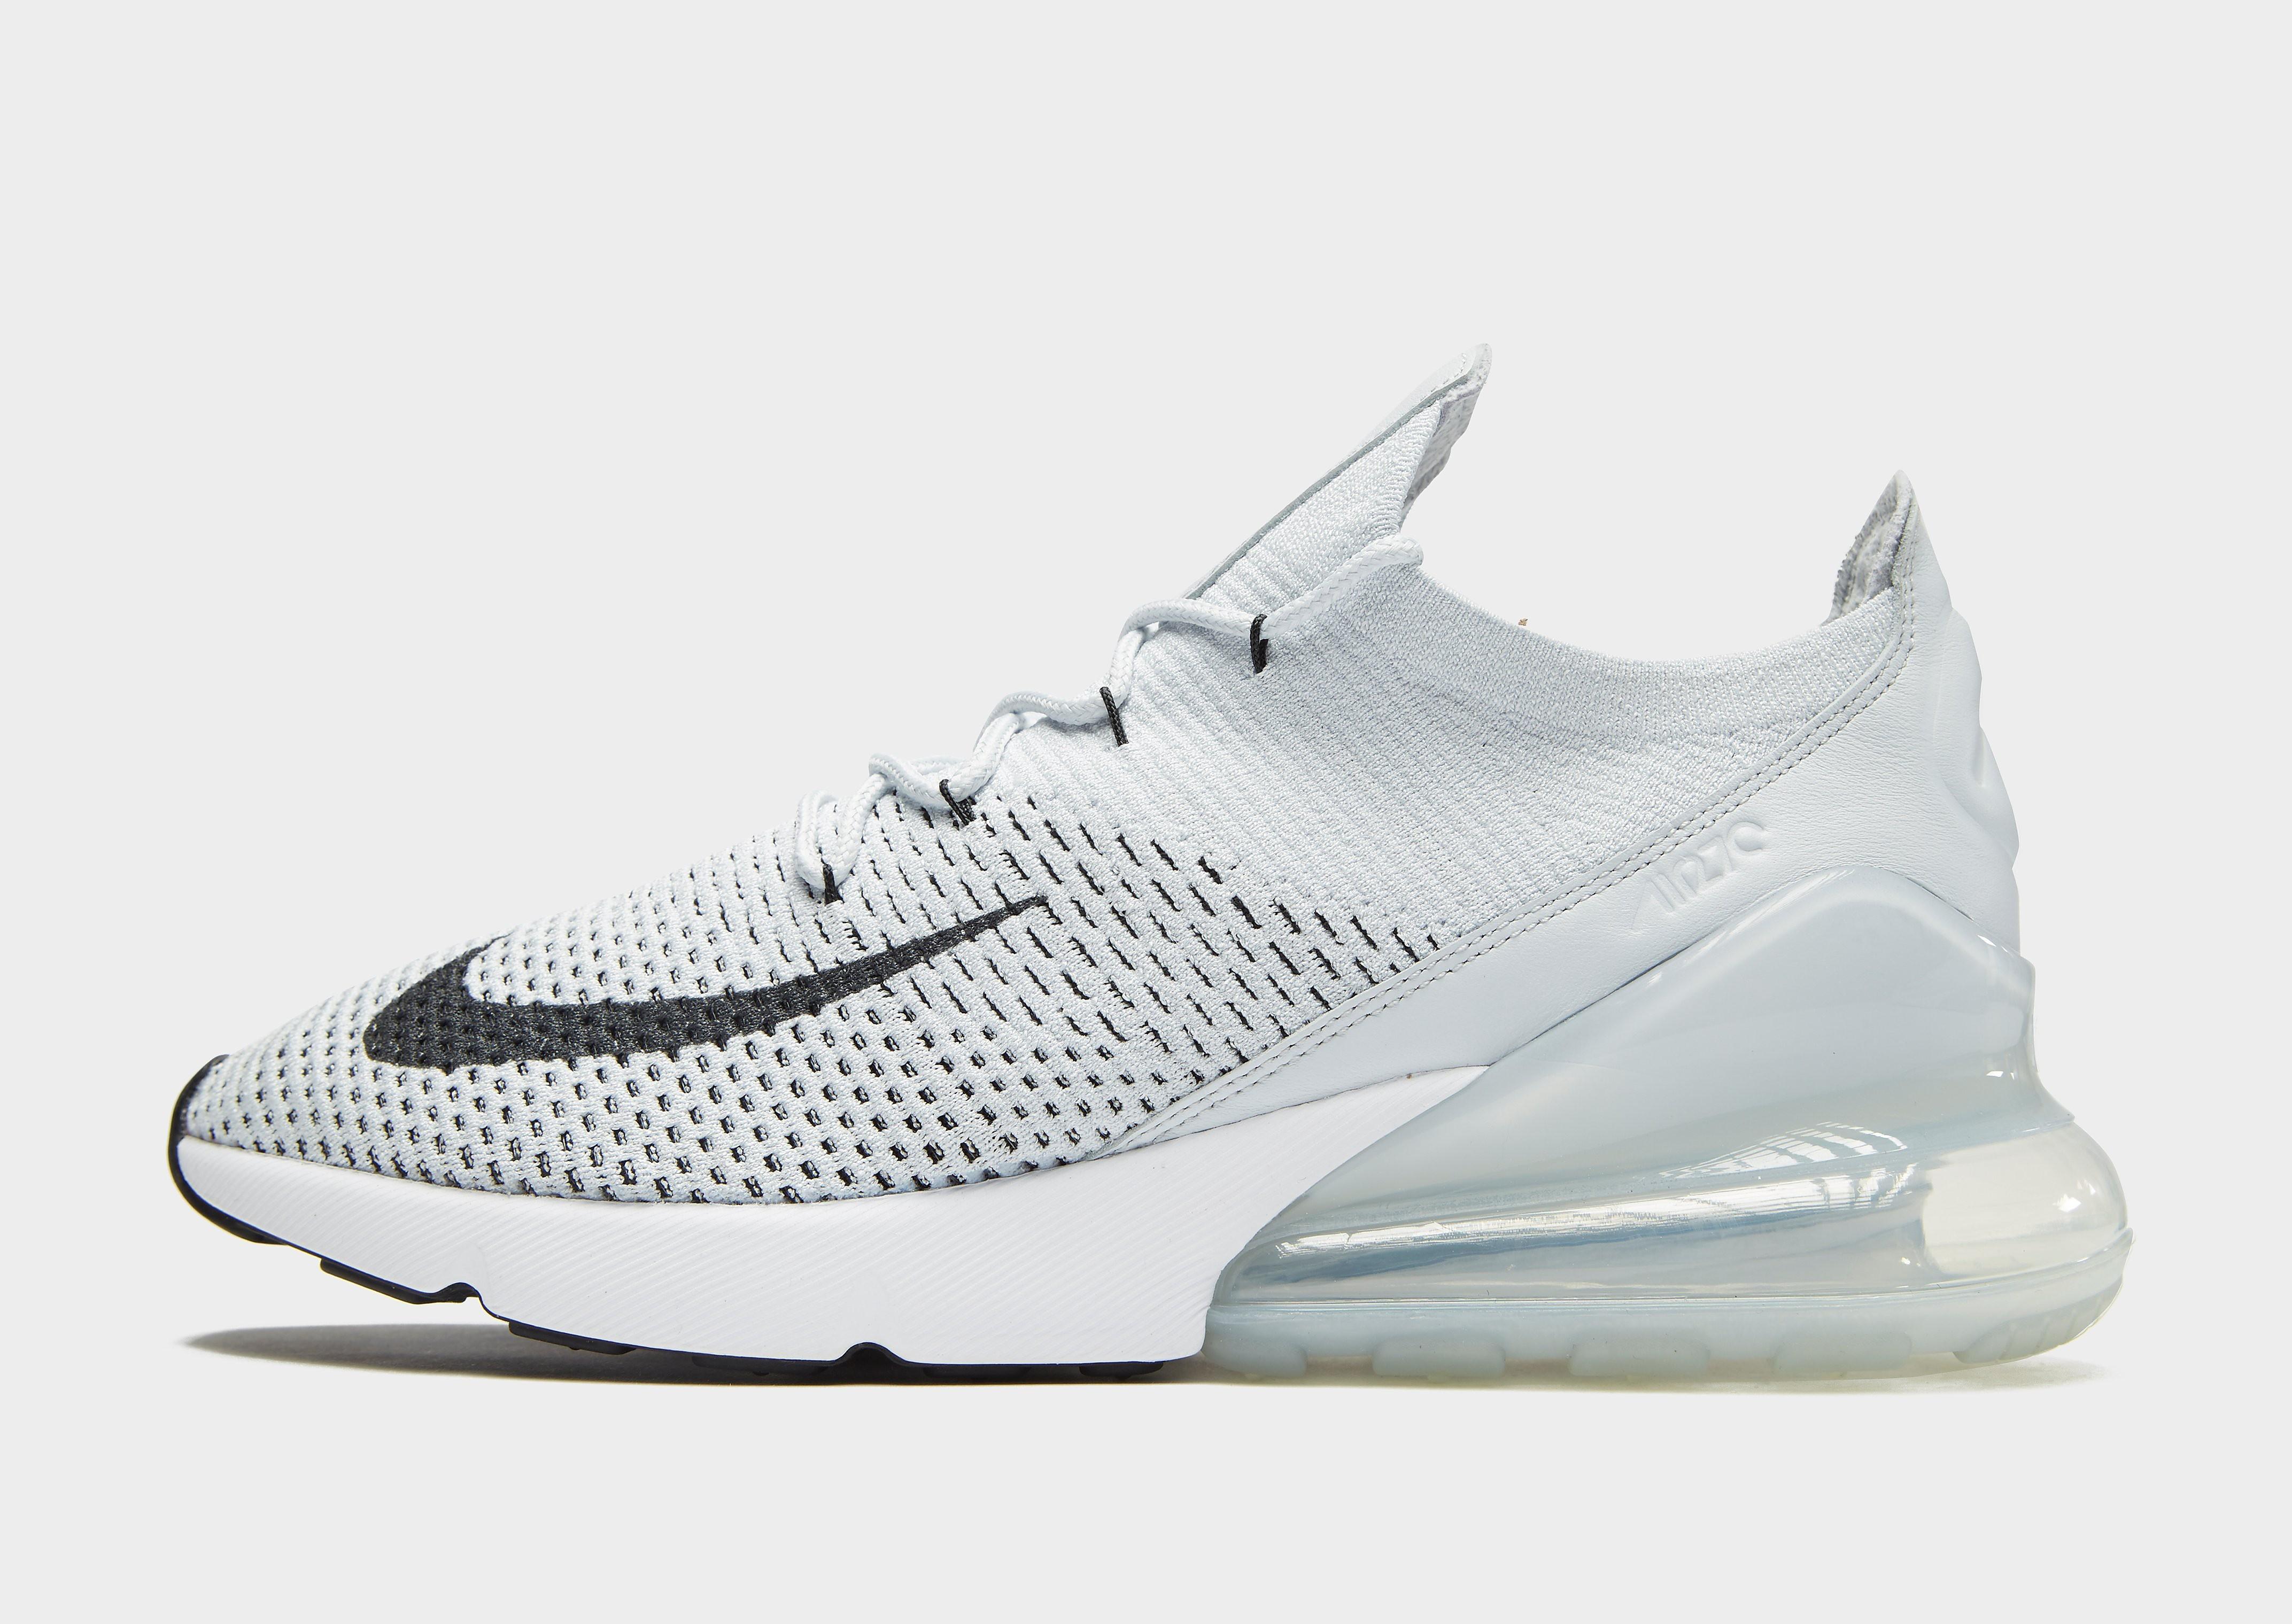 Nike Air Max 270 Flyknit Herre